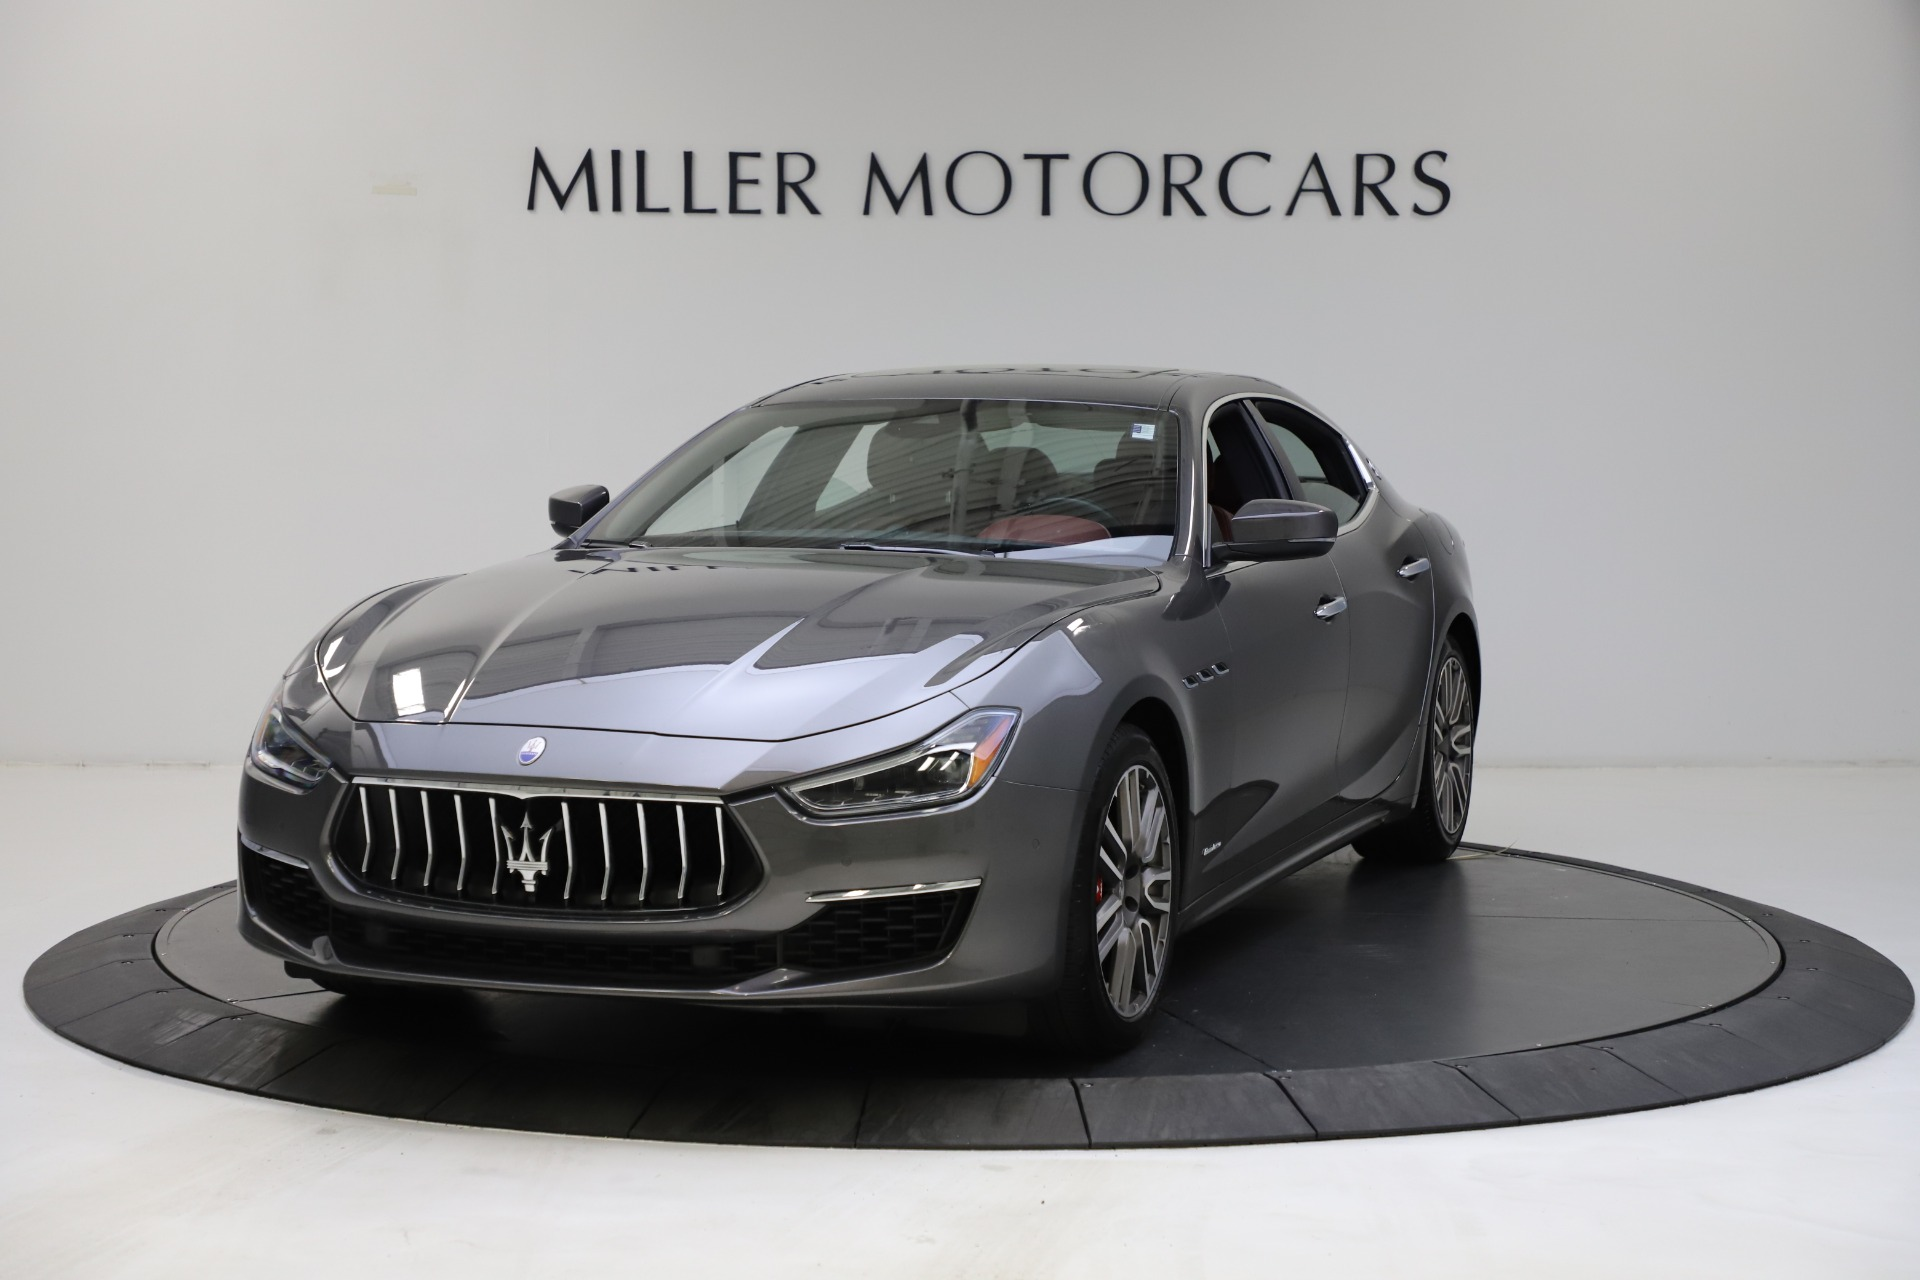 Used 2018 Maserati Ghibli SQ4 GranLusso for sale $55,900 at Alfa Romeo of Greenwich in Greenwich CT 06830 1